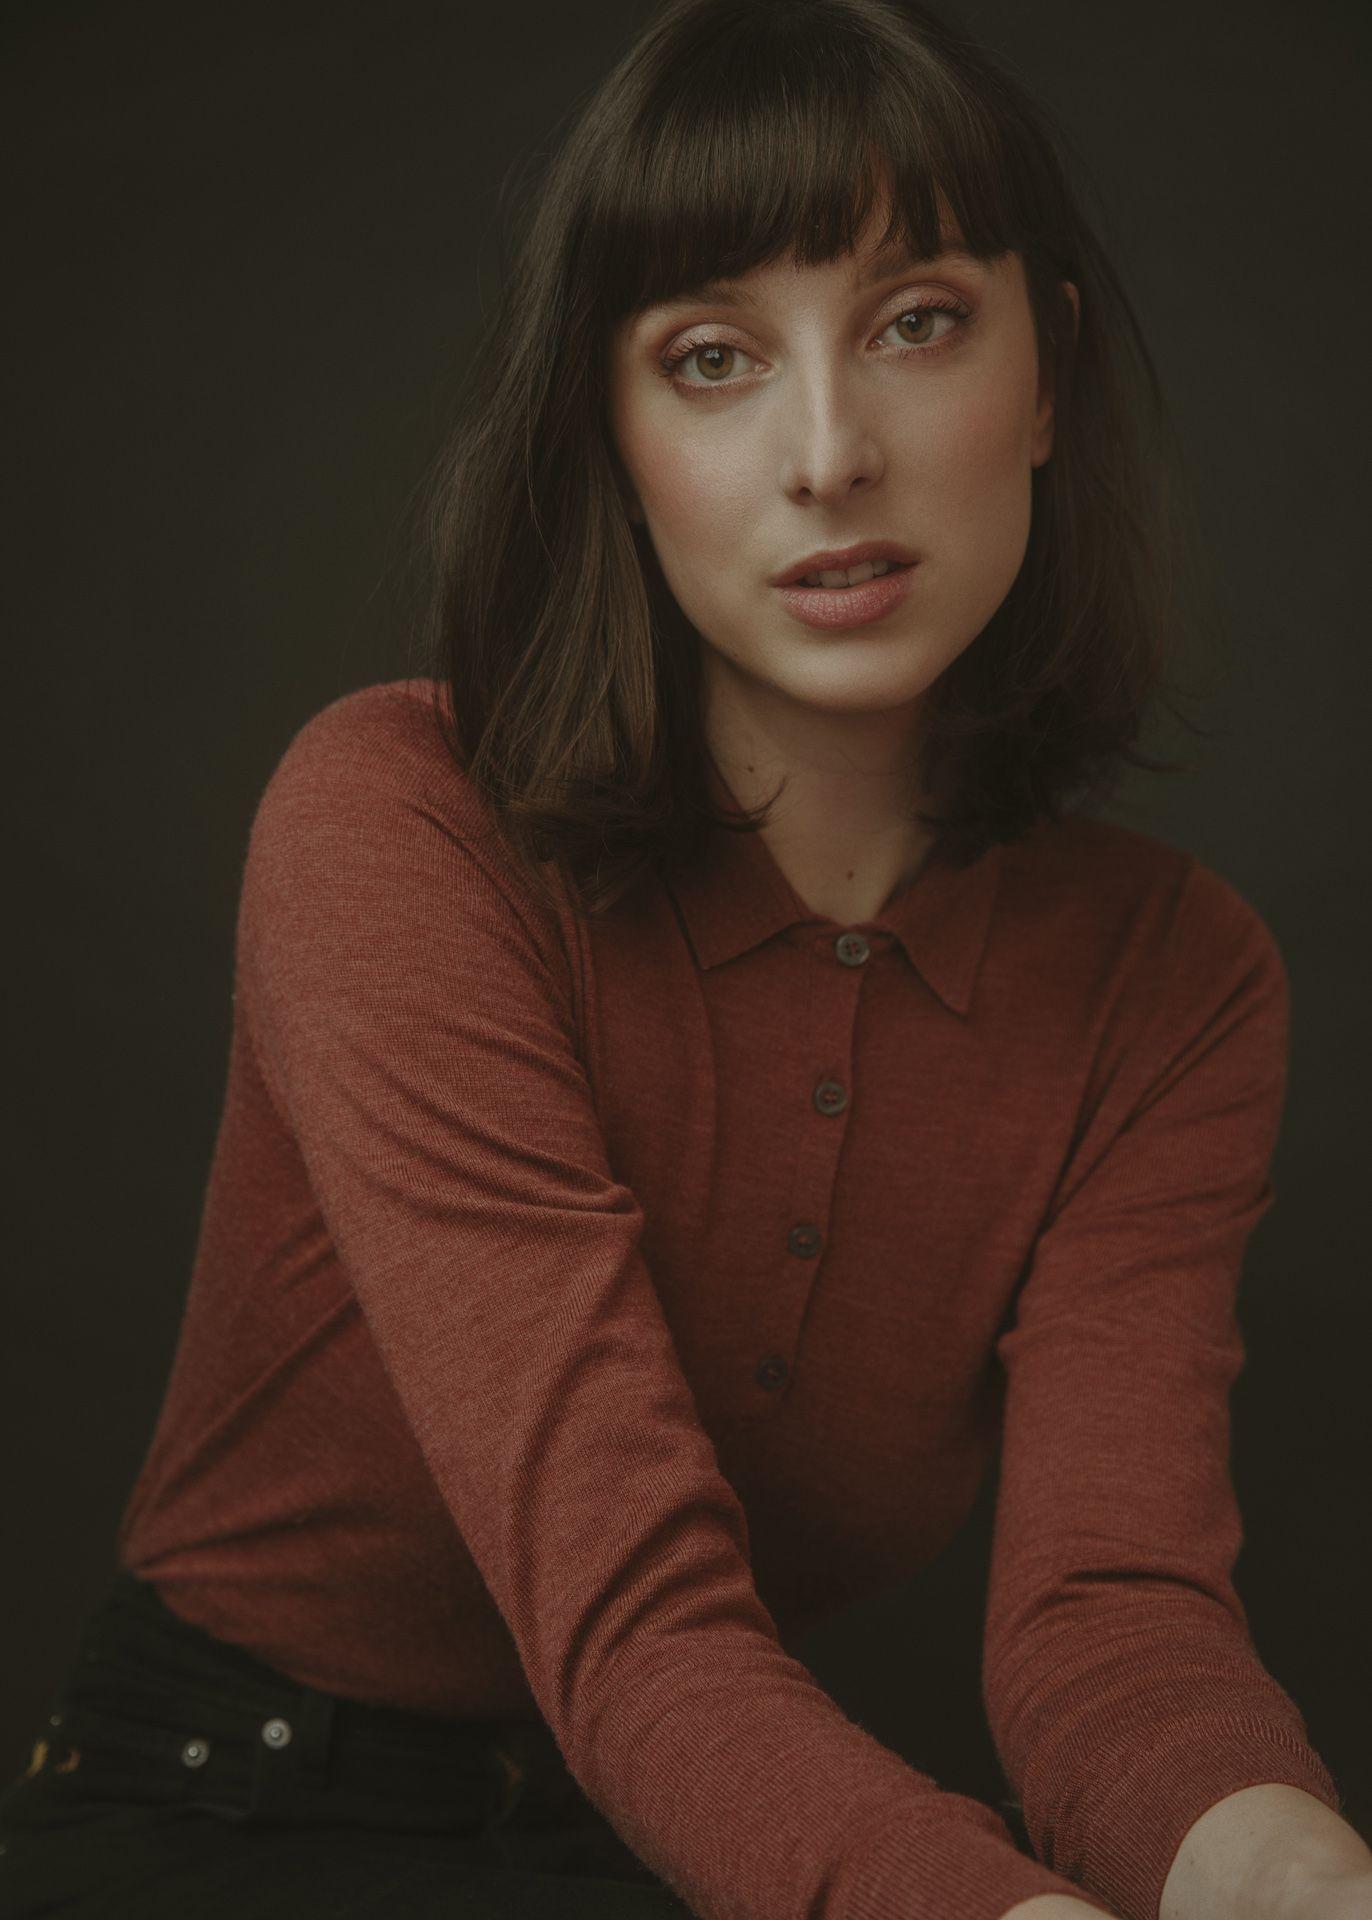 Sarah-Maude Beauchesne author of novel Les Fourchettes photographed by Kelly Jacob